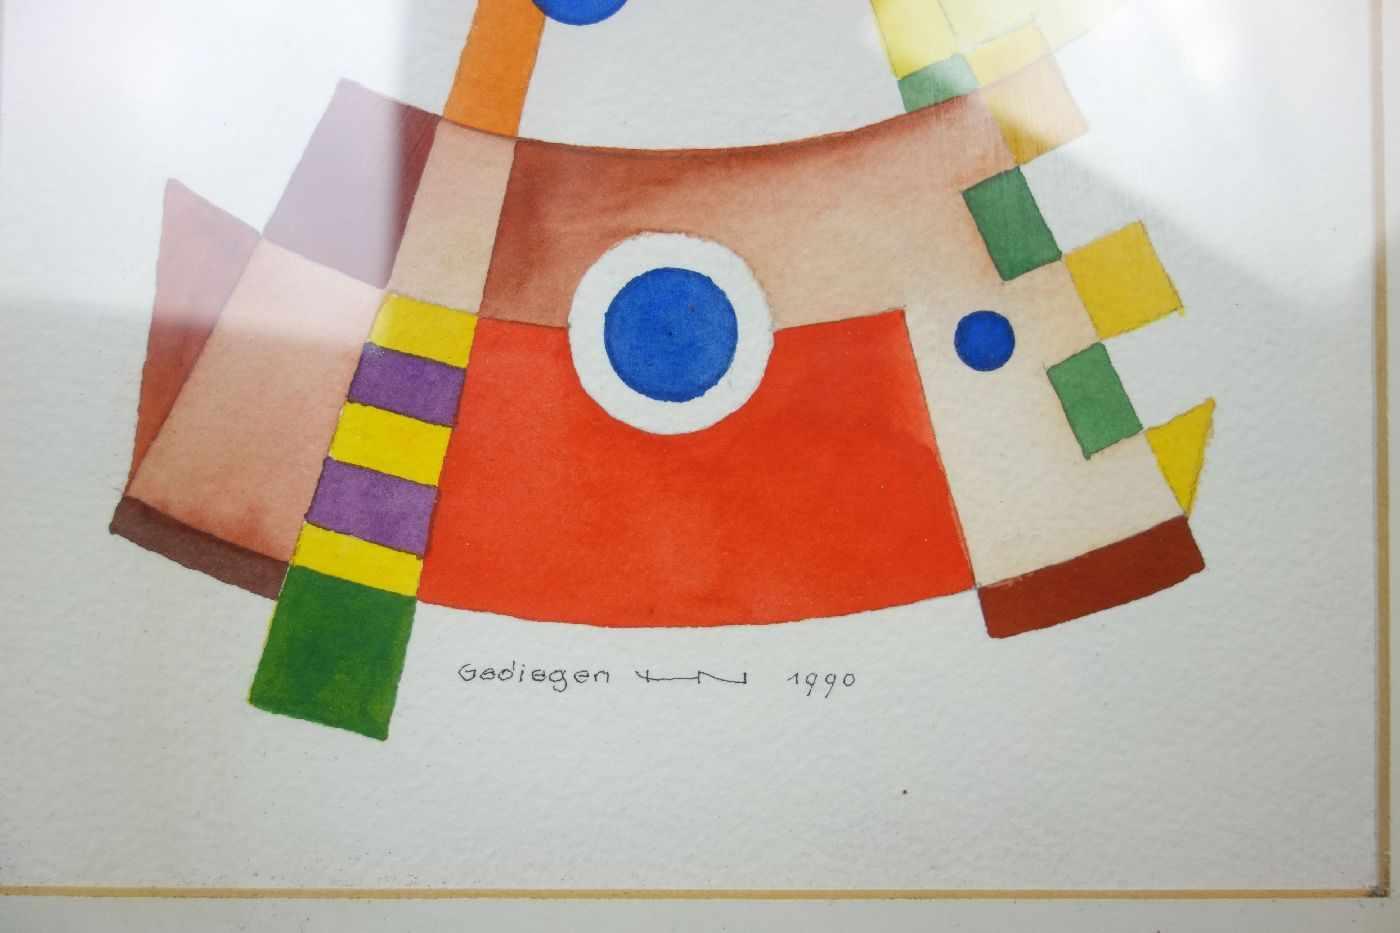 Lot 5 - NEUY, HEINRICH (Kevelaer 1911-2003 Steinfurt-Borghorst), Aquarell über Bleistift auf Bütten /